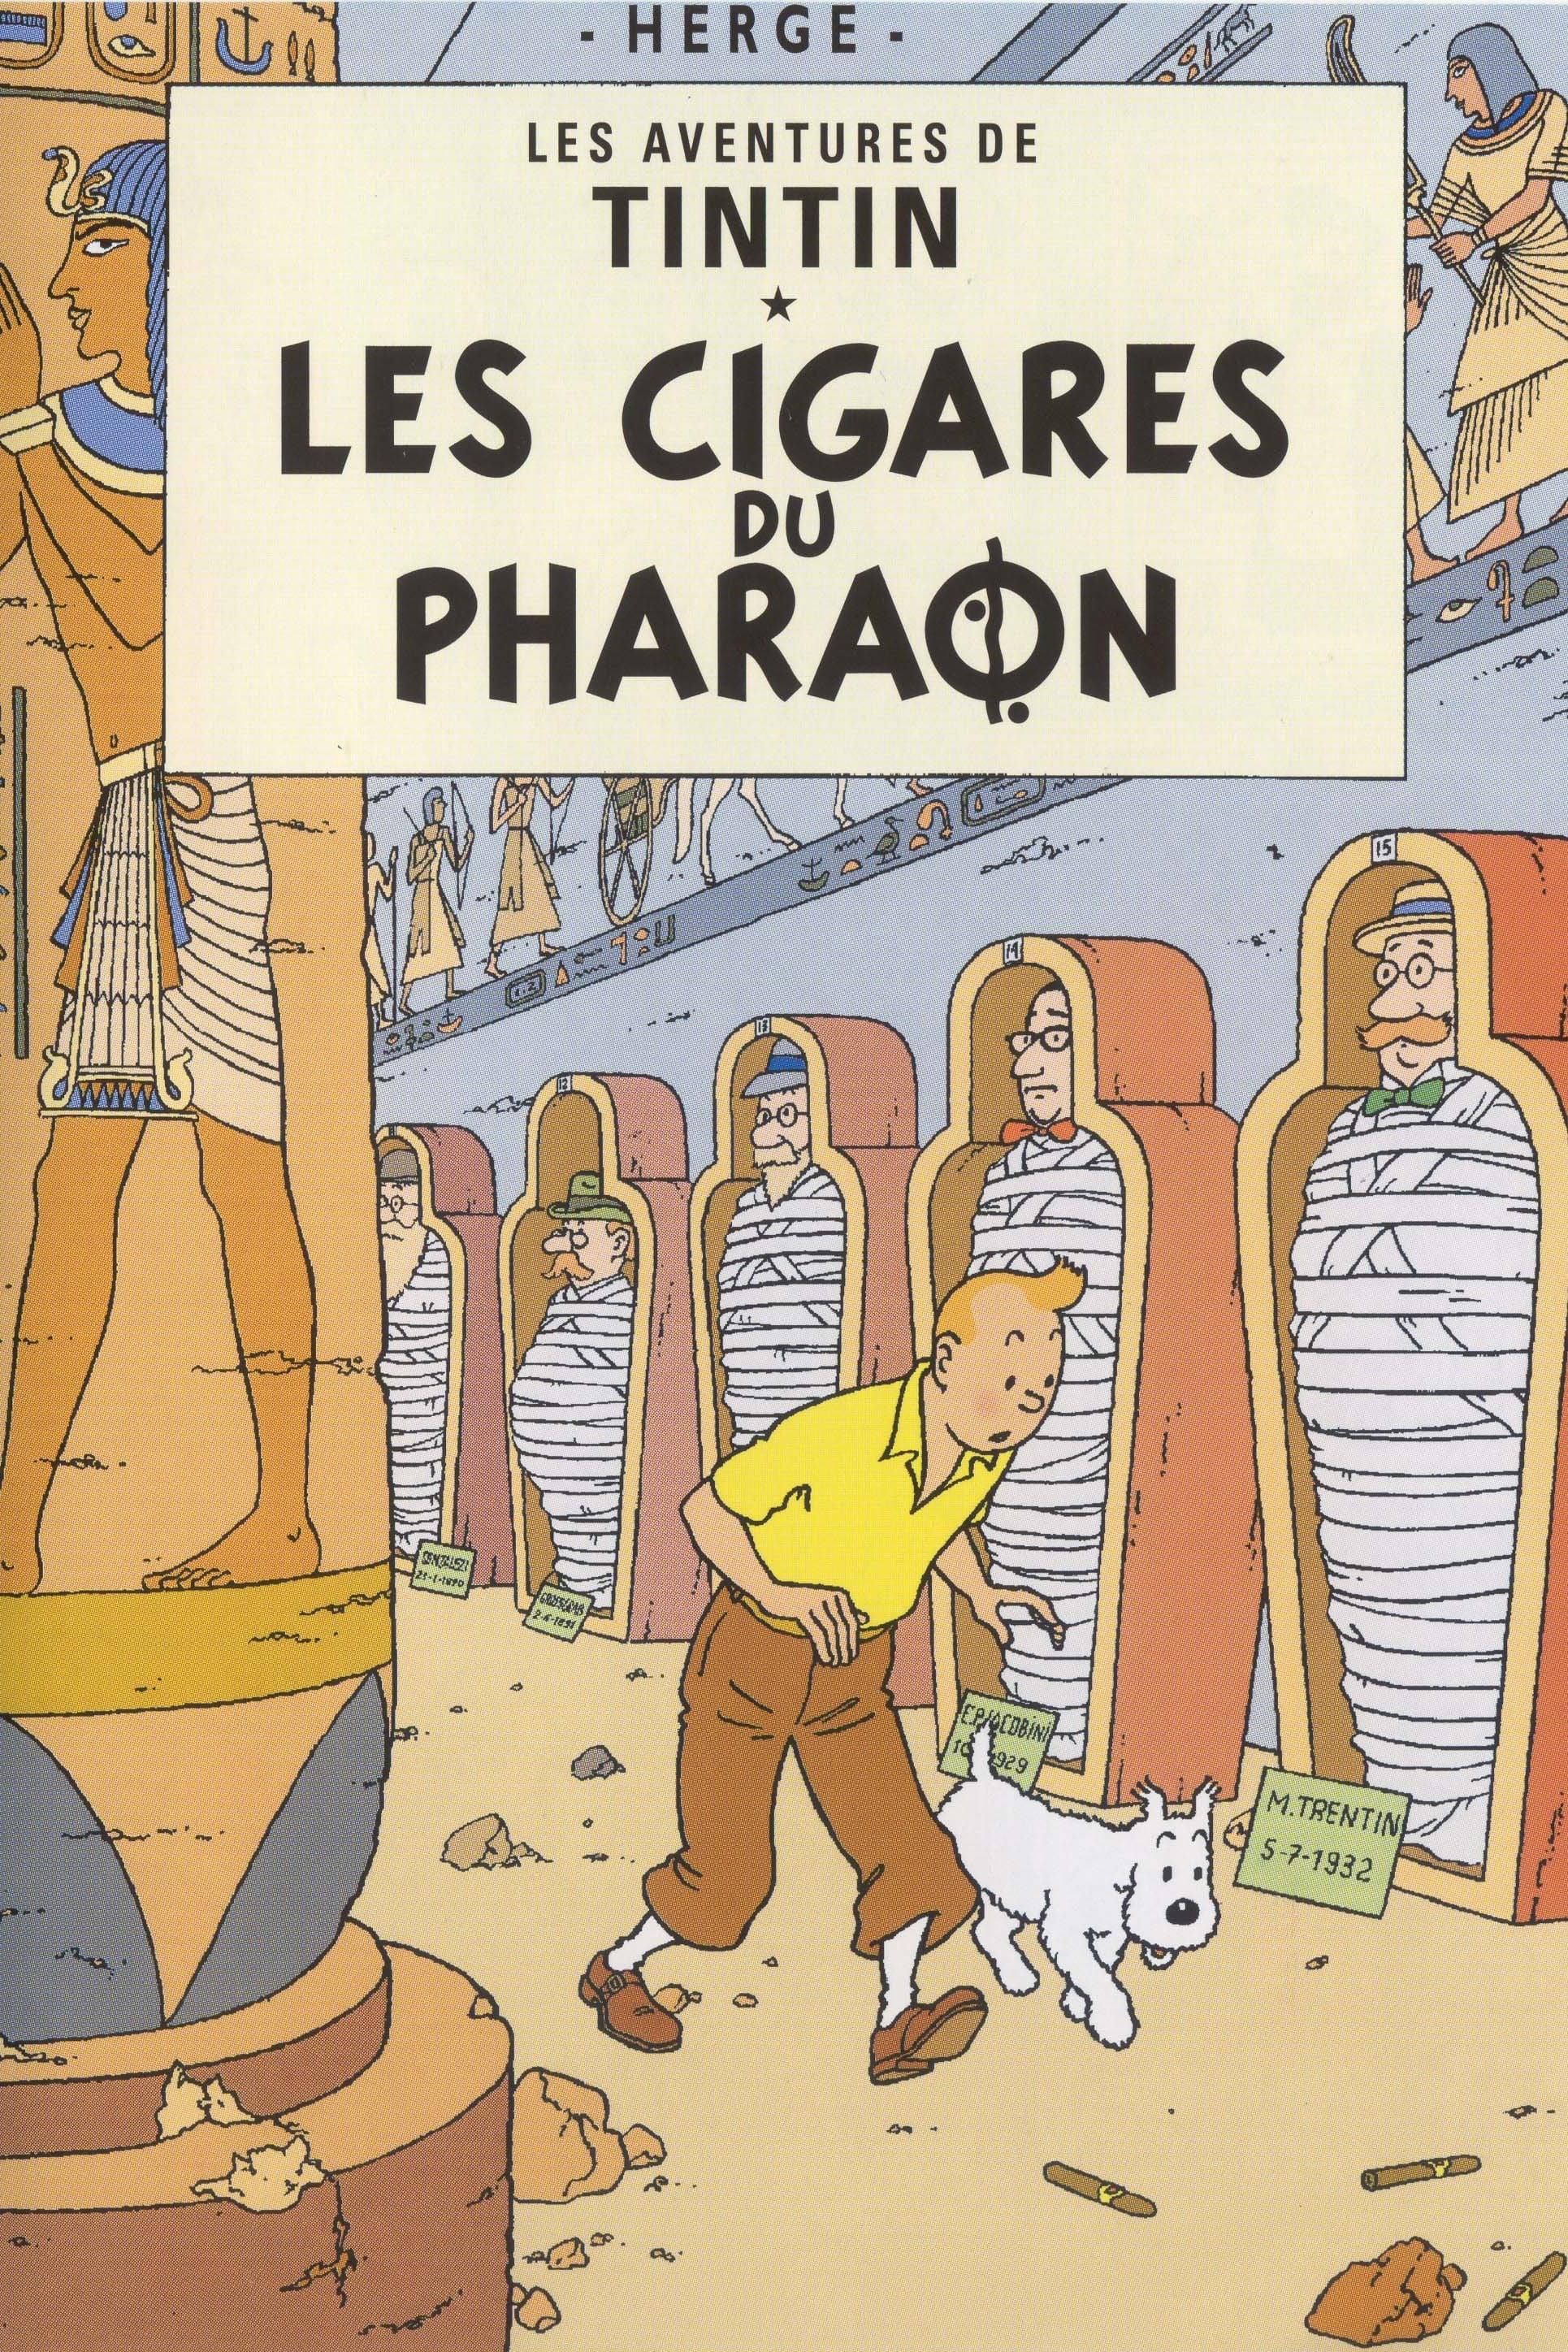 Les Aventures De Tintin 02  Les Cigares Du Pharaon - 1991